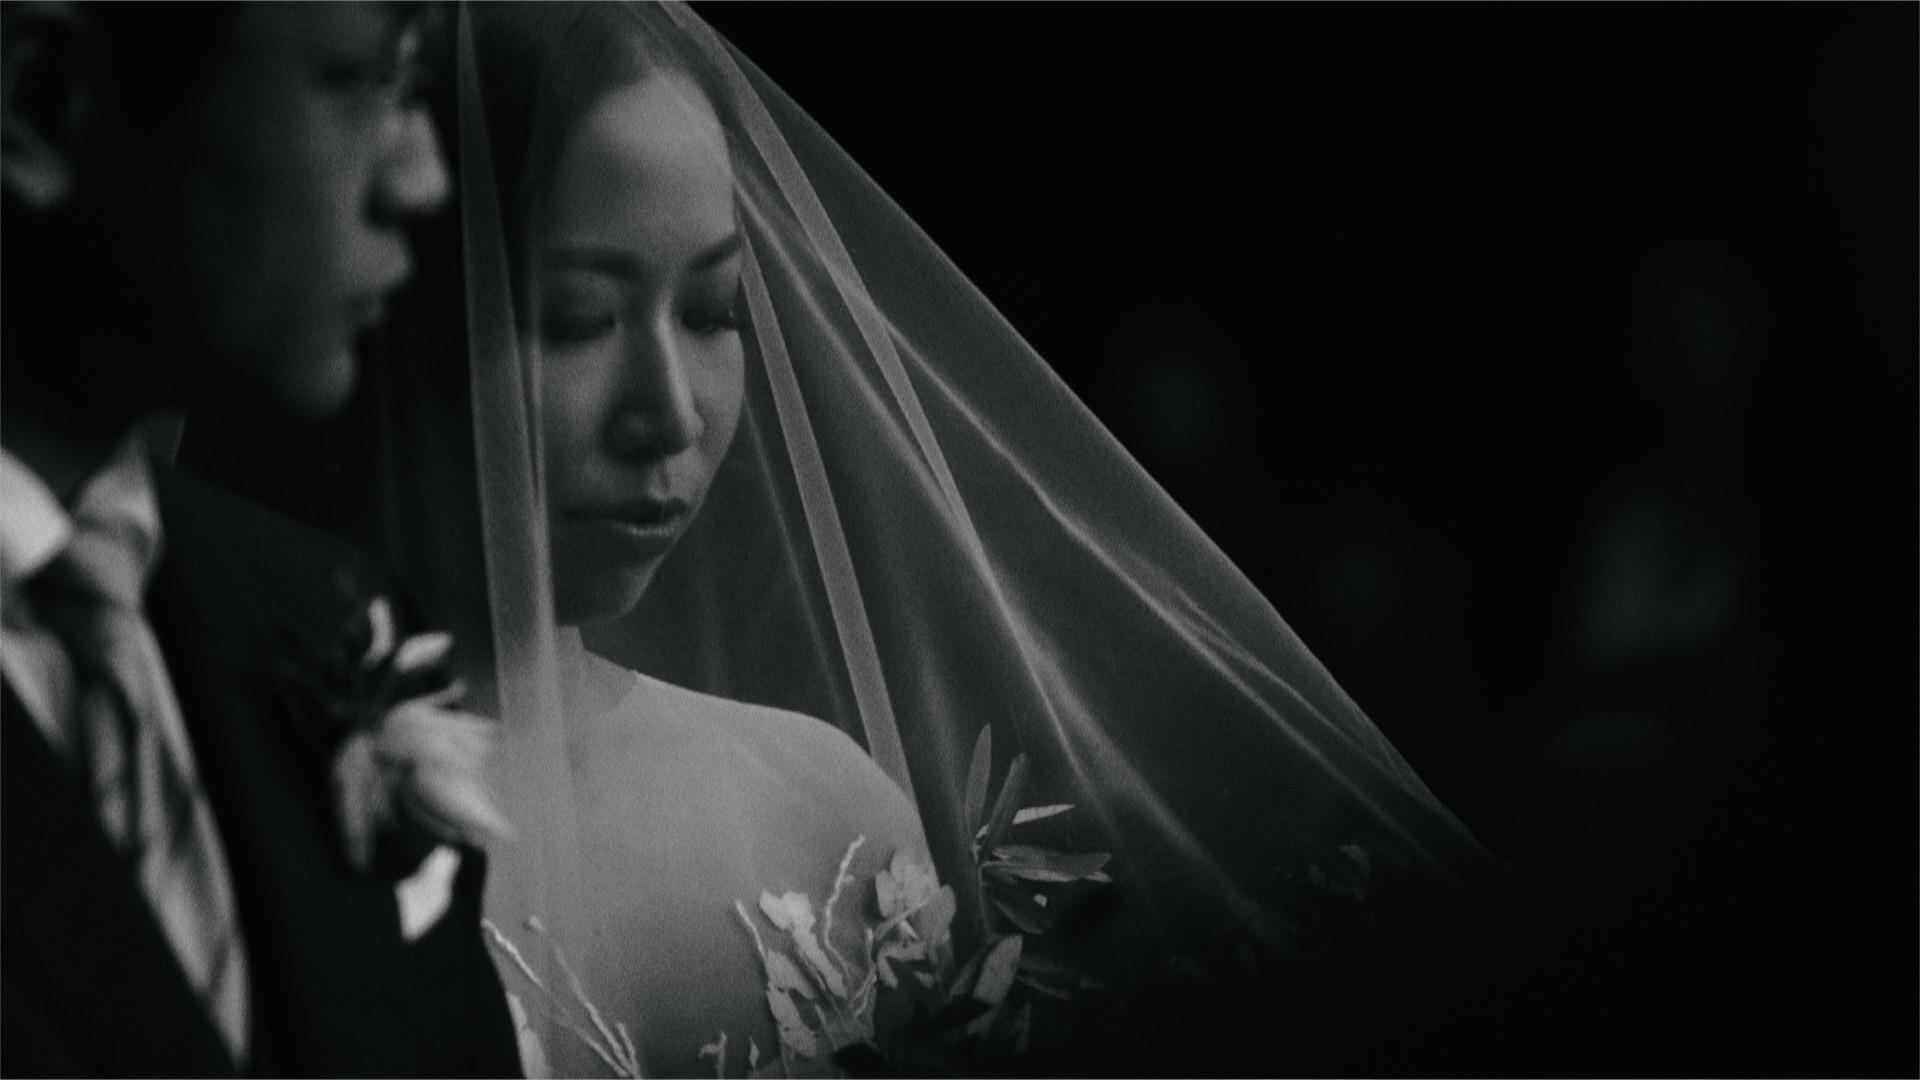 Repulse Bay Wedding Video in Hong Kong